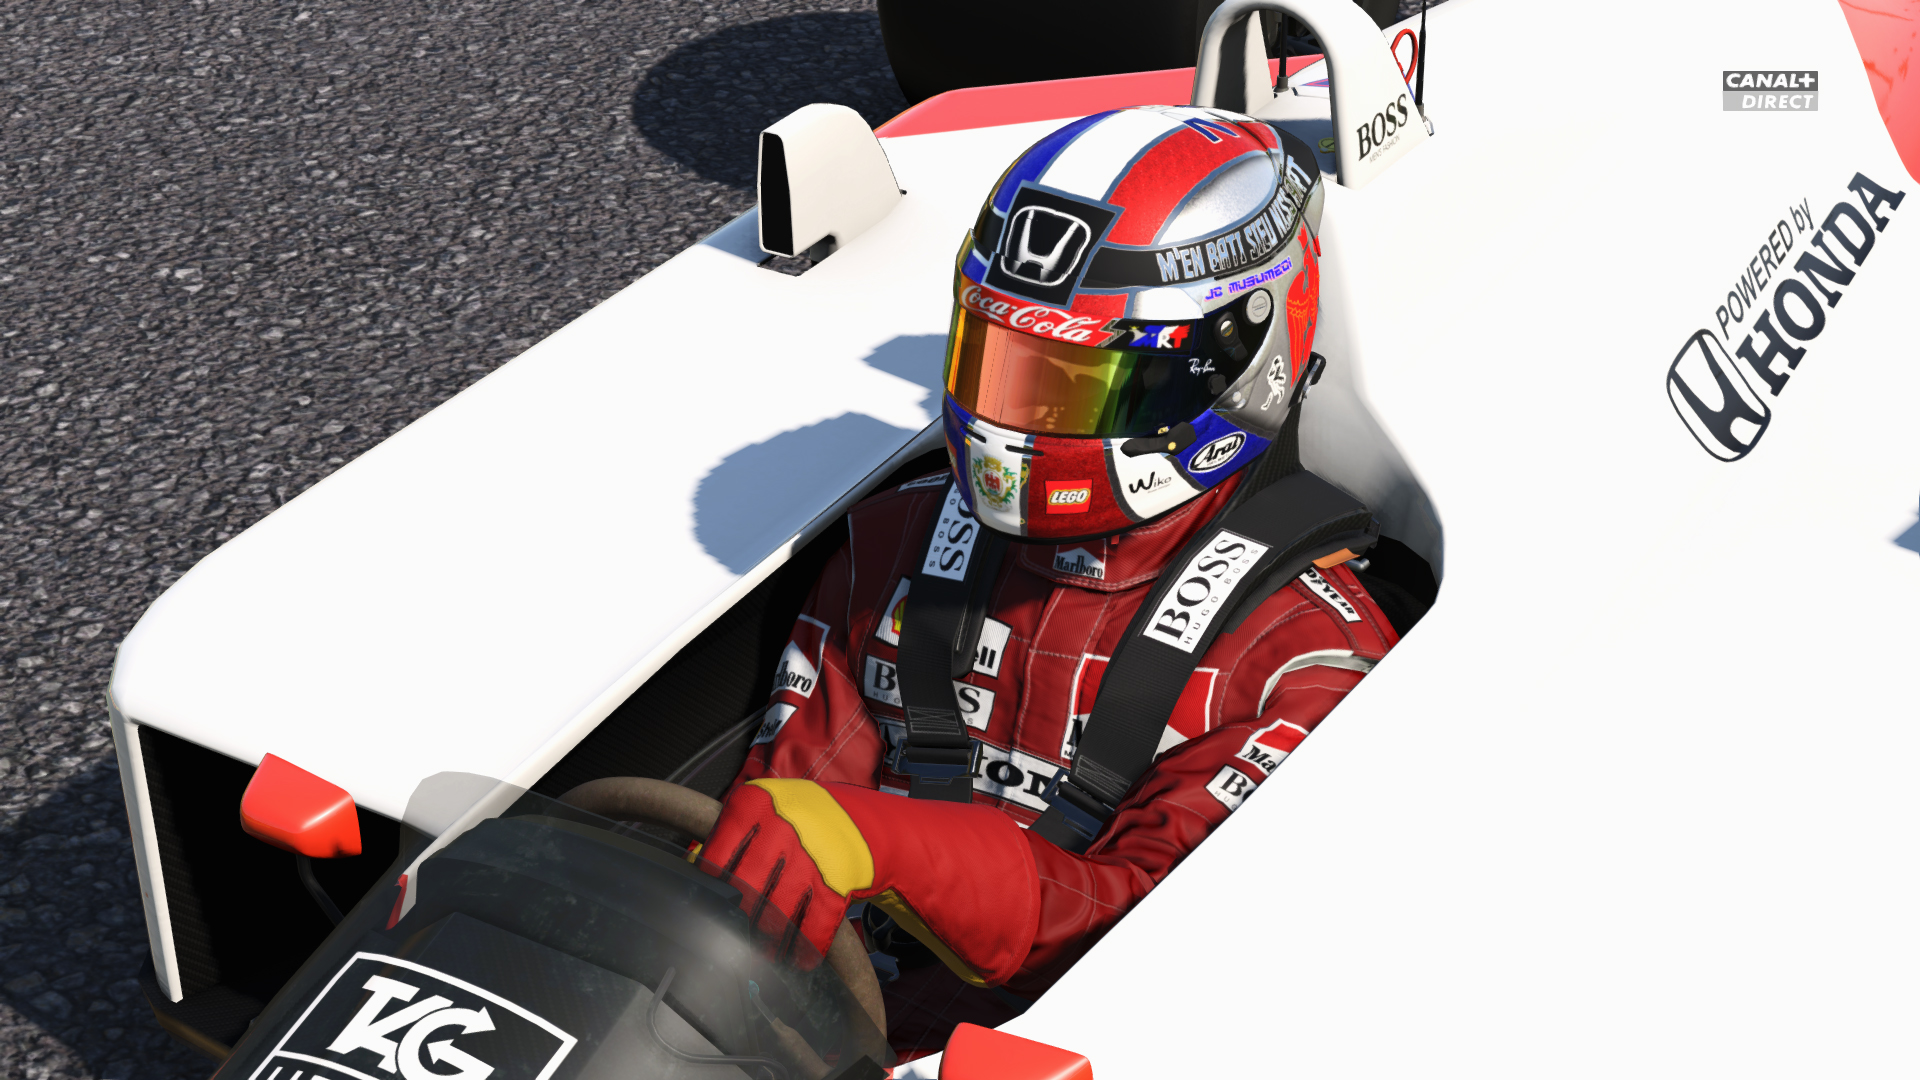 F1_2017_photo_20171019_002610.jpg